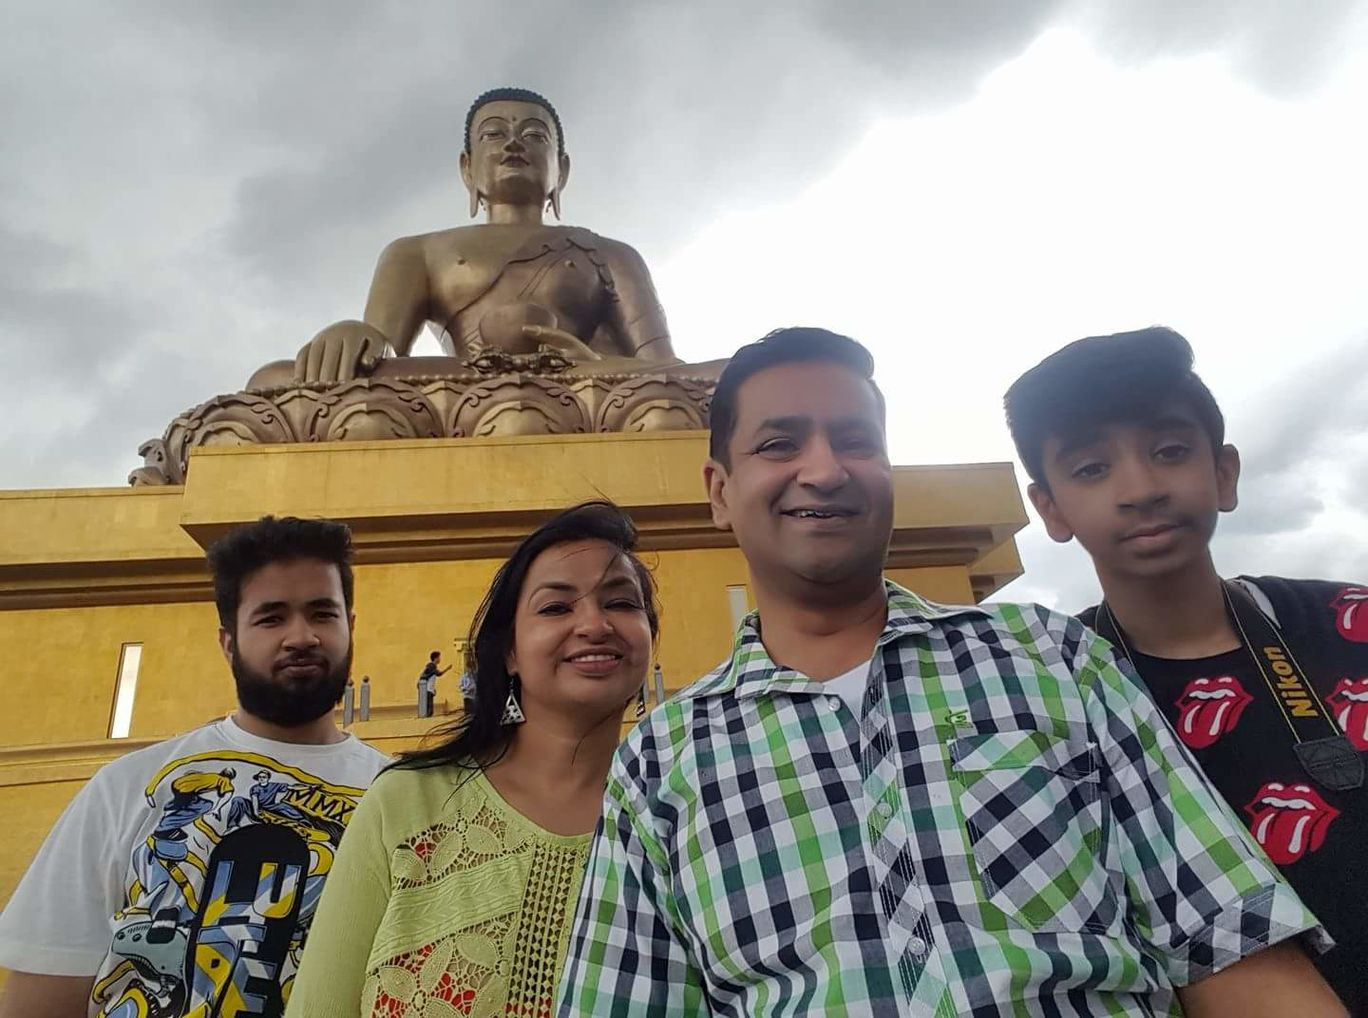 Photo of Bhutan By Sapna Udaywal